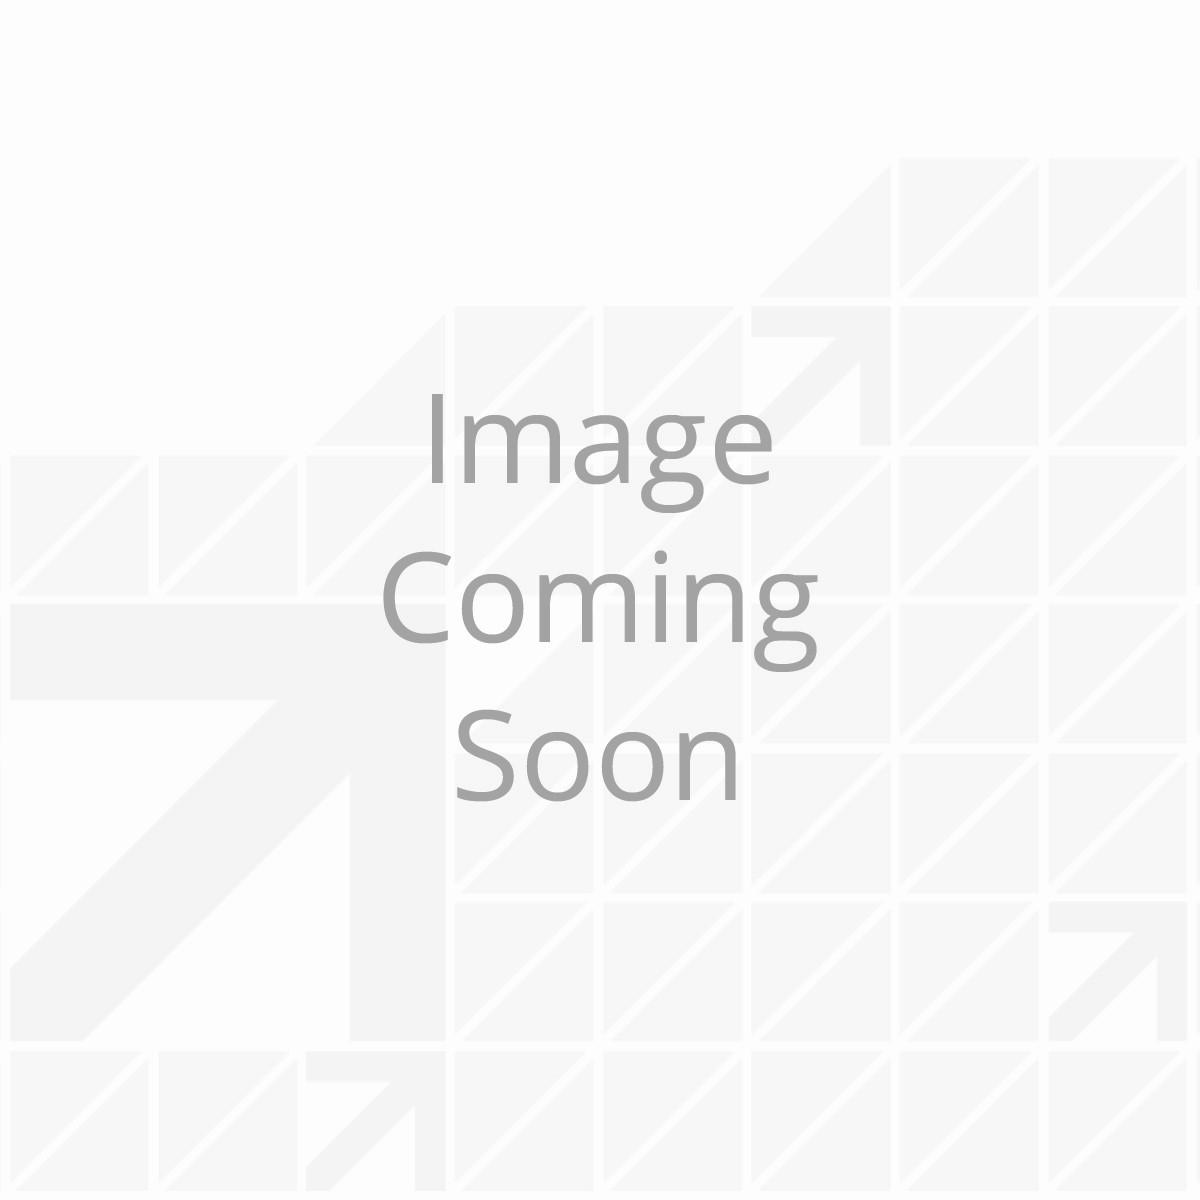 19' Power & Hybrid Awning Roller Assembly - Prepflex White Fade